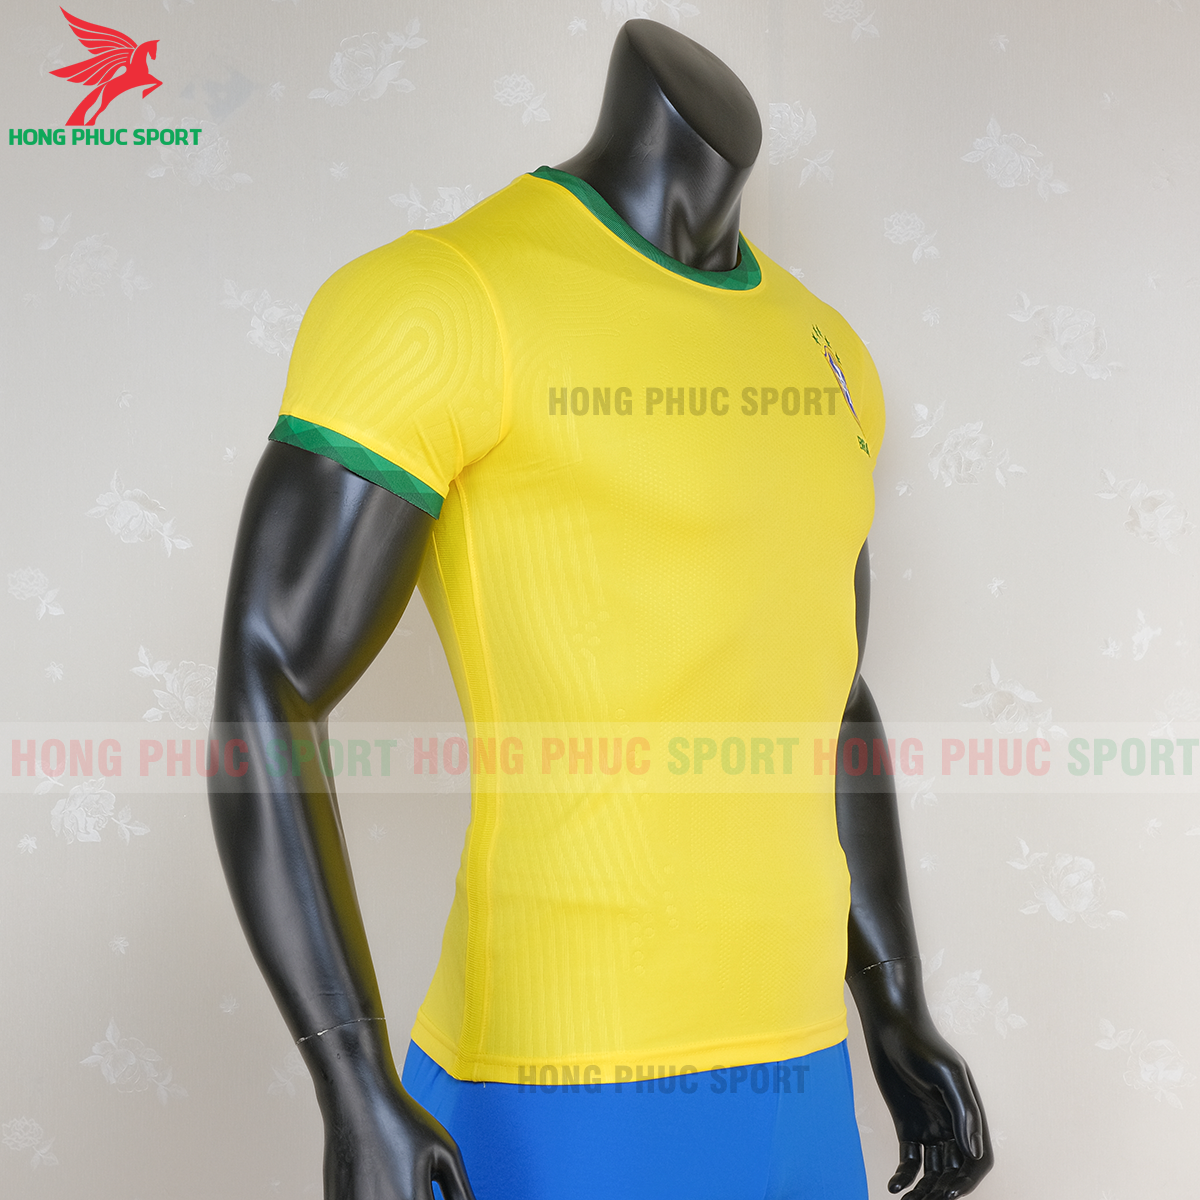 https://cdn.hongphucsport.com/unsafe/s4.shopbay.vn/files/285/ao-bong-da-tuyen-brazil-2020-2021-san-nha-2-5f7169996e0cc.png